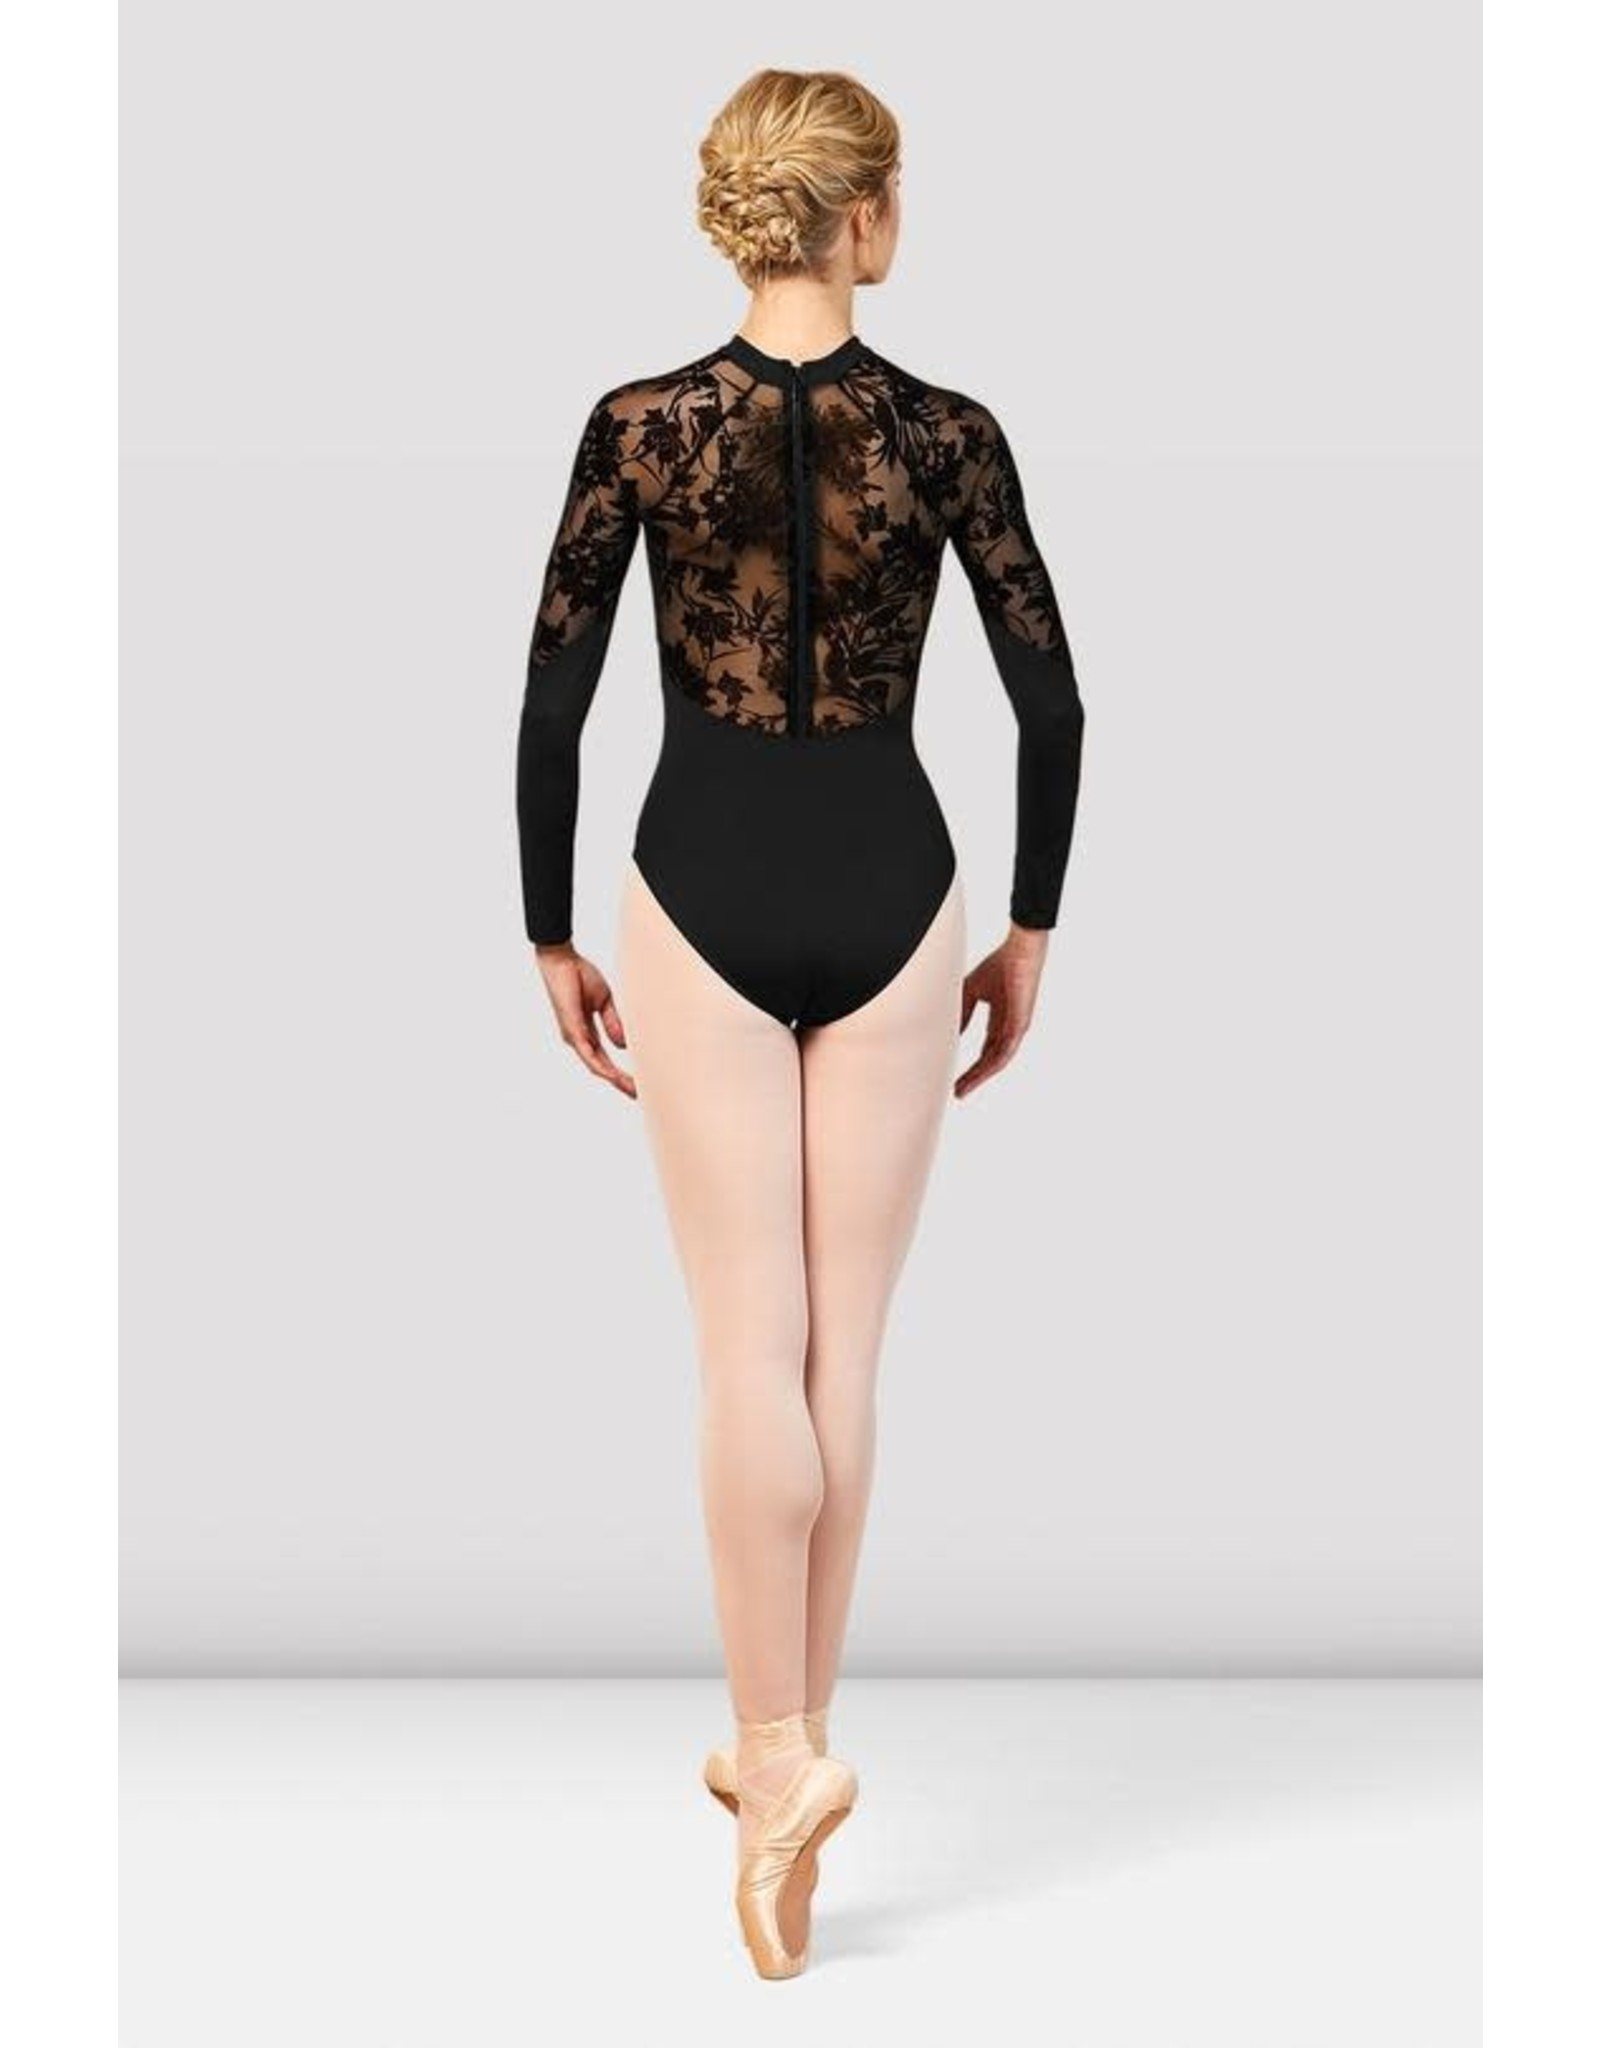 Bloch L7839 Balletpak Kahlo floral mesh